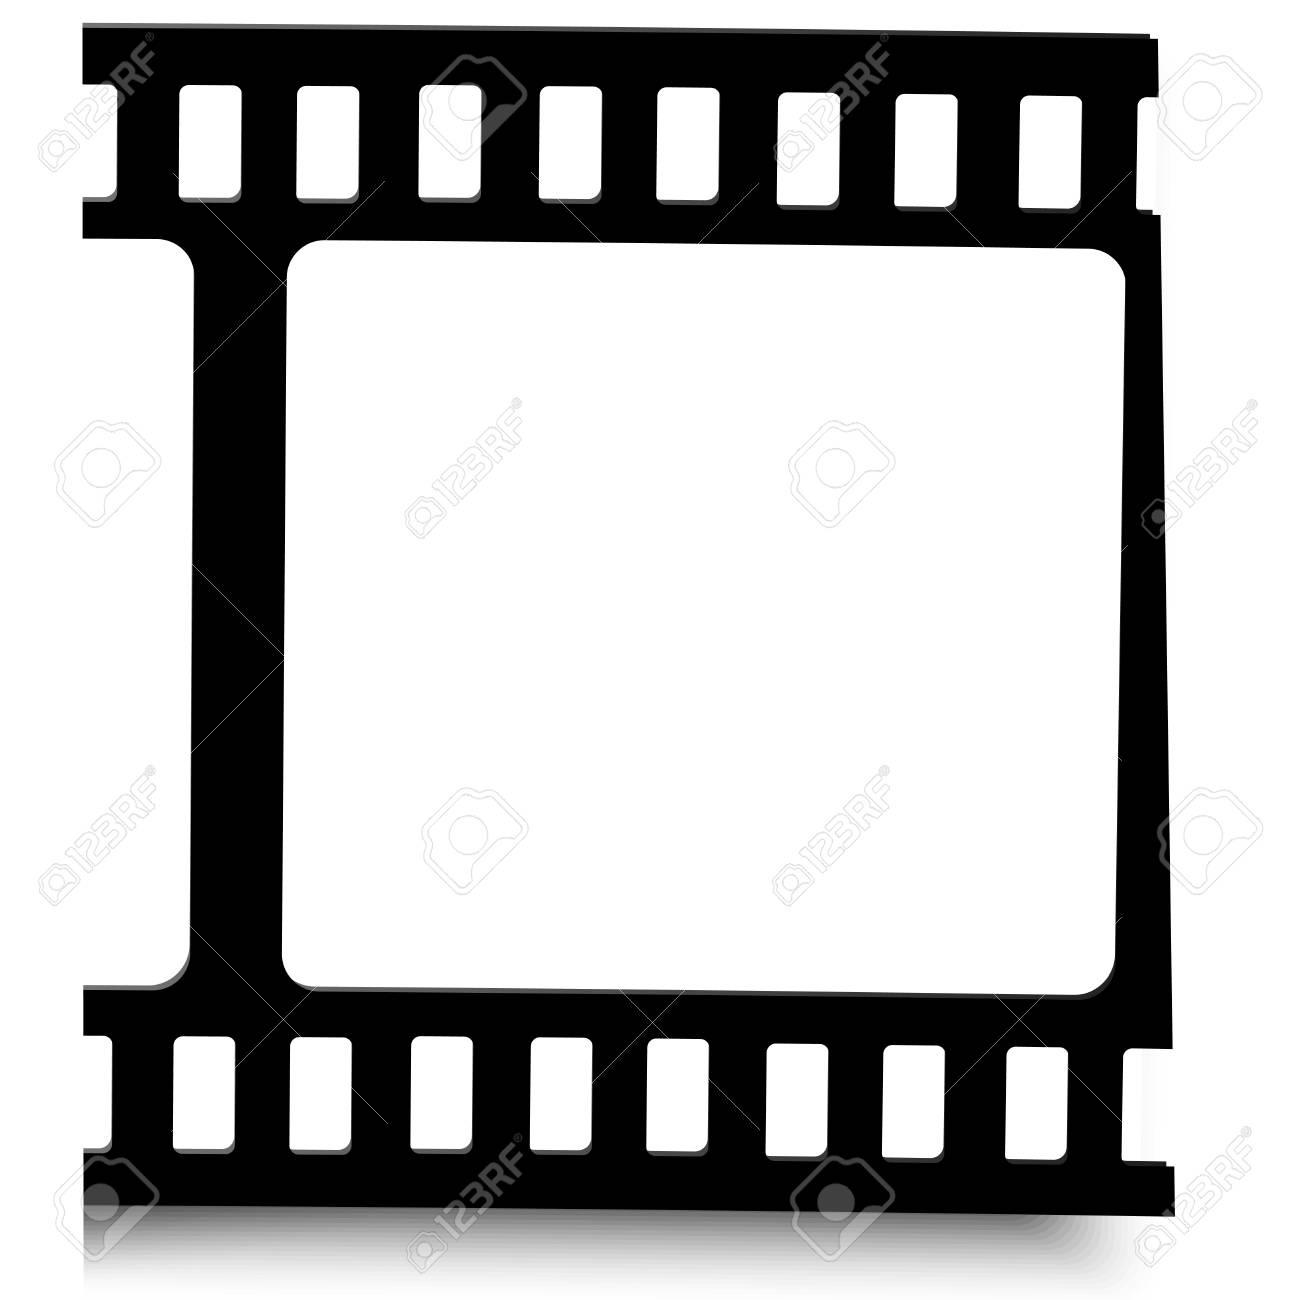 Set of film frame illustration film movie photo filmstrip stock set of film frame illustration film movie photo filmstrip stock illustration 84981498 jeuxipadfo Image collections